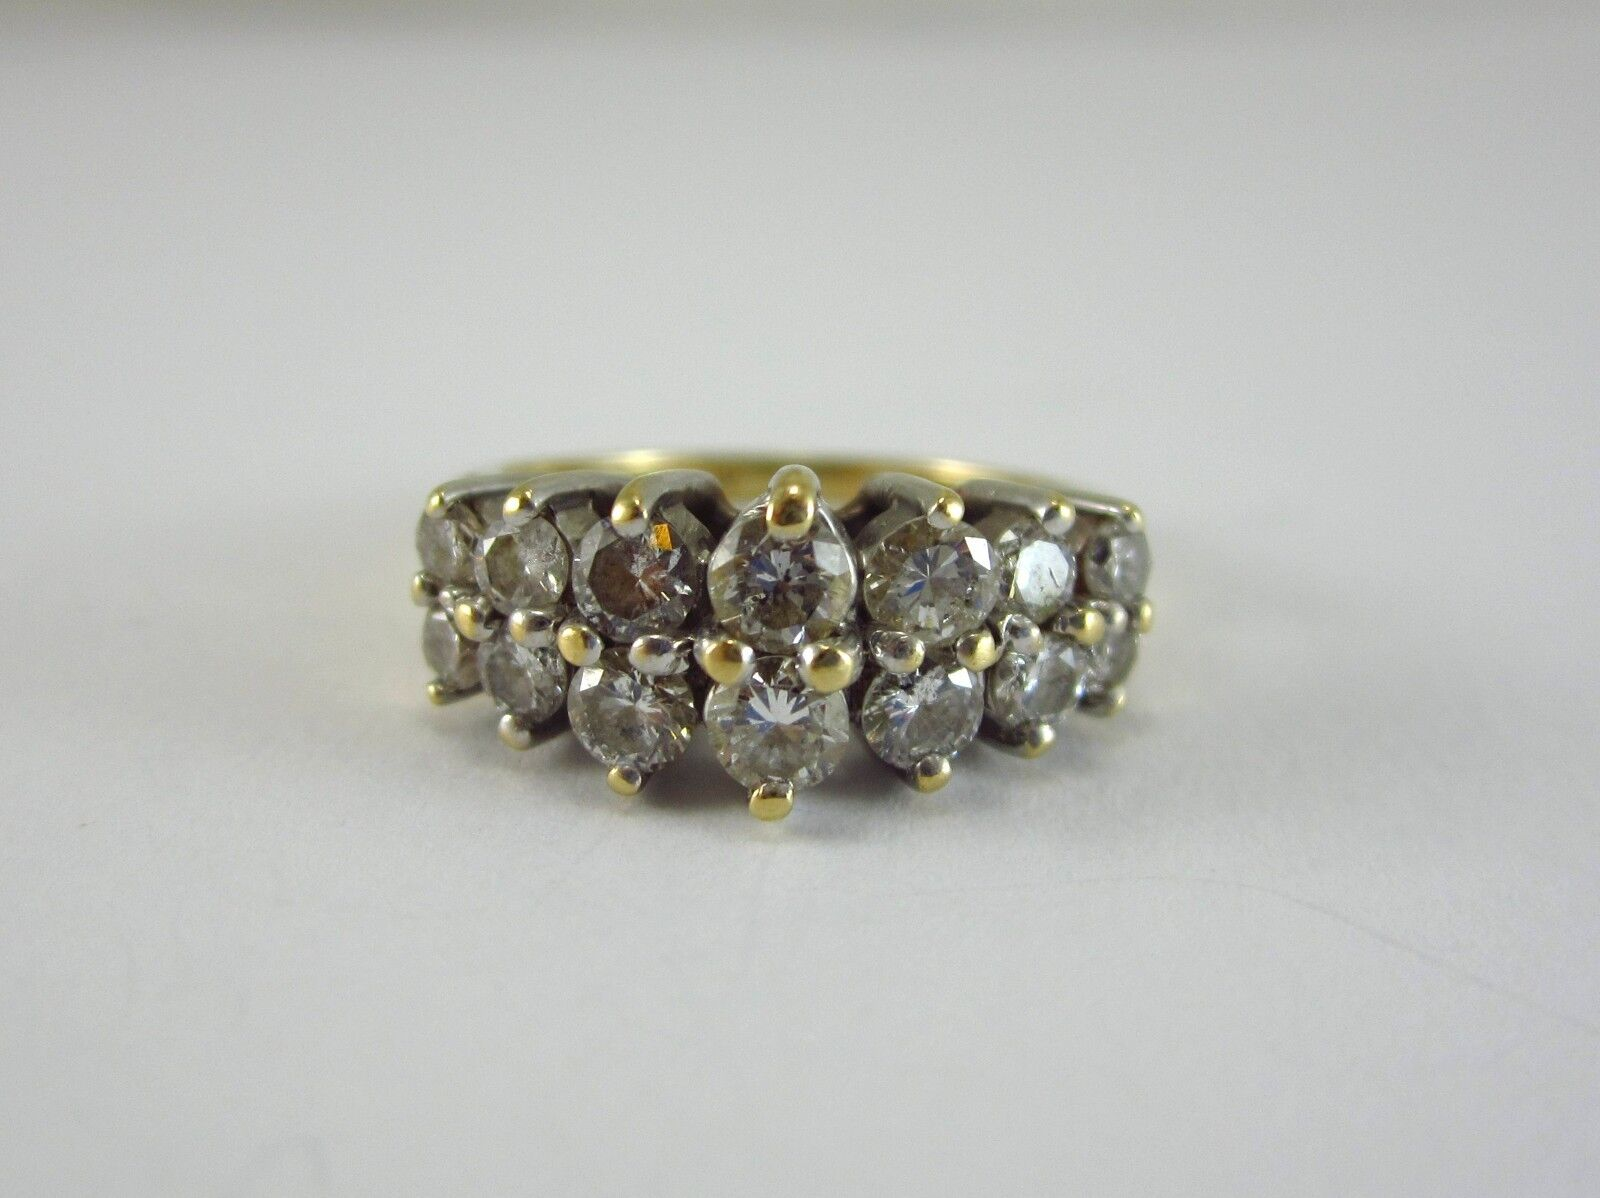 BEAUTIFUL LADIES MAGIC-GLO 14K gold DIAMOND CLUSTER STYLE RING 3.7G 0.94CT